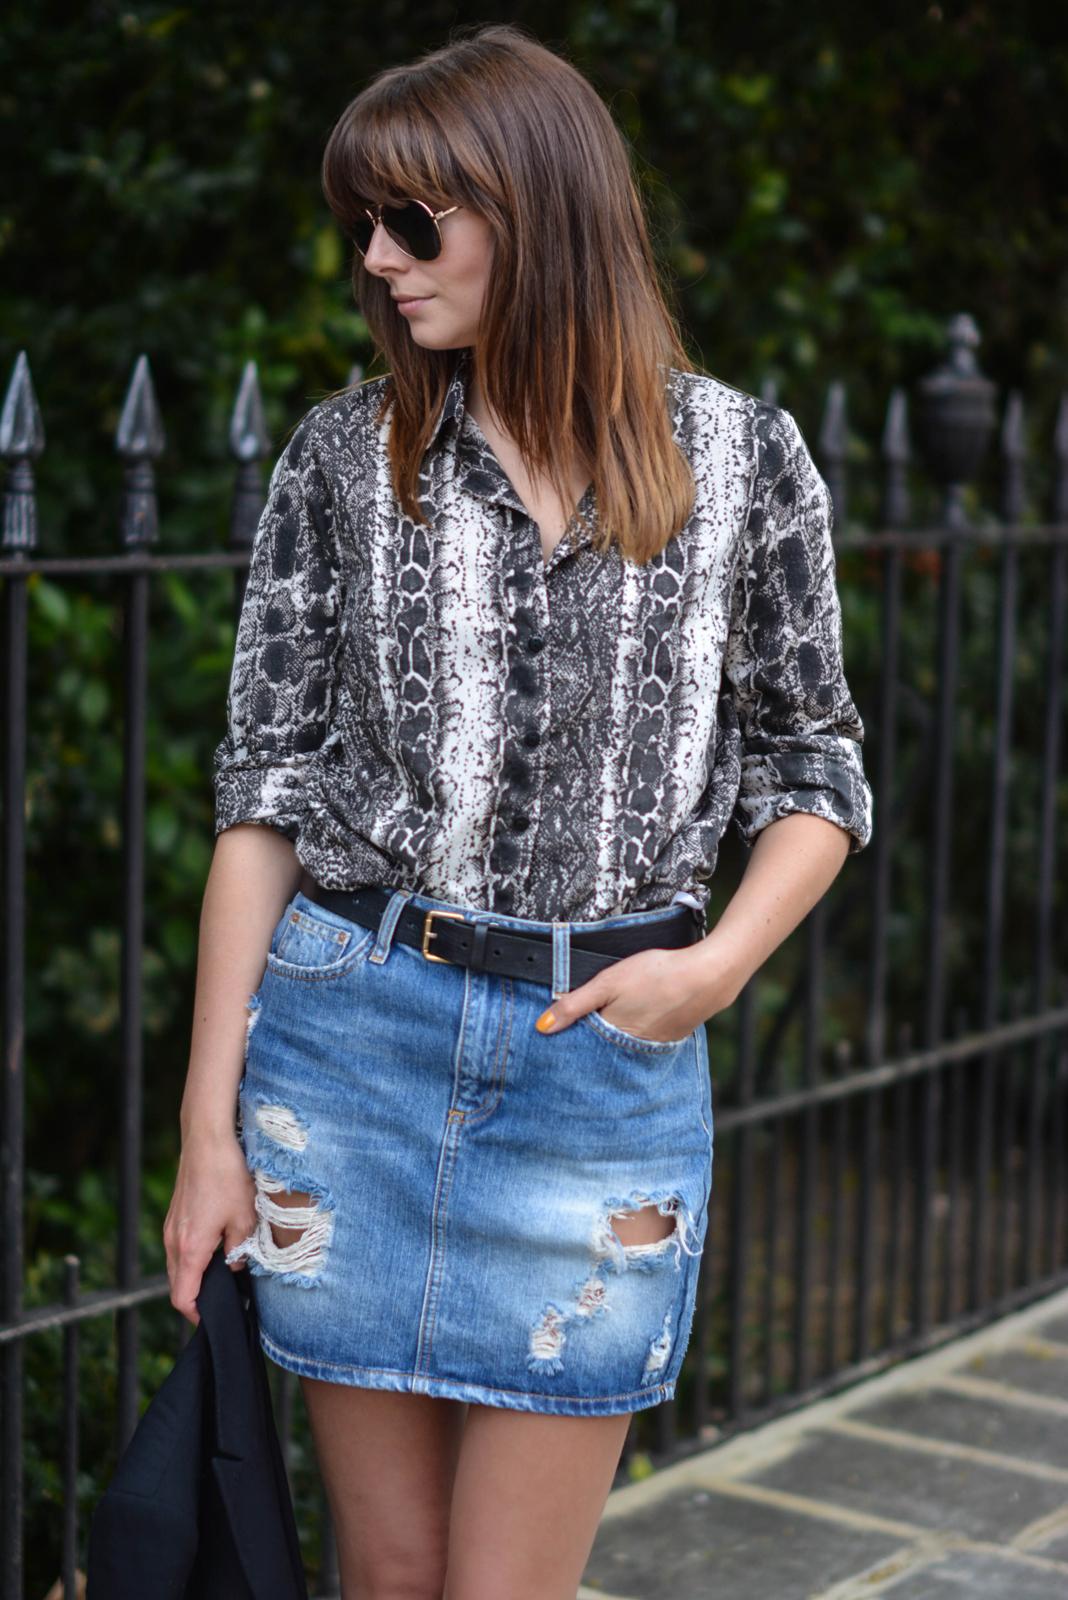 EJSTYLE - Snakskin print shirt, denim mini skirt, black belt, aviator sunglasses